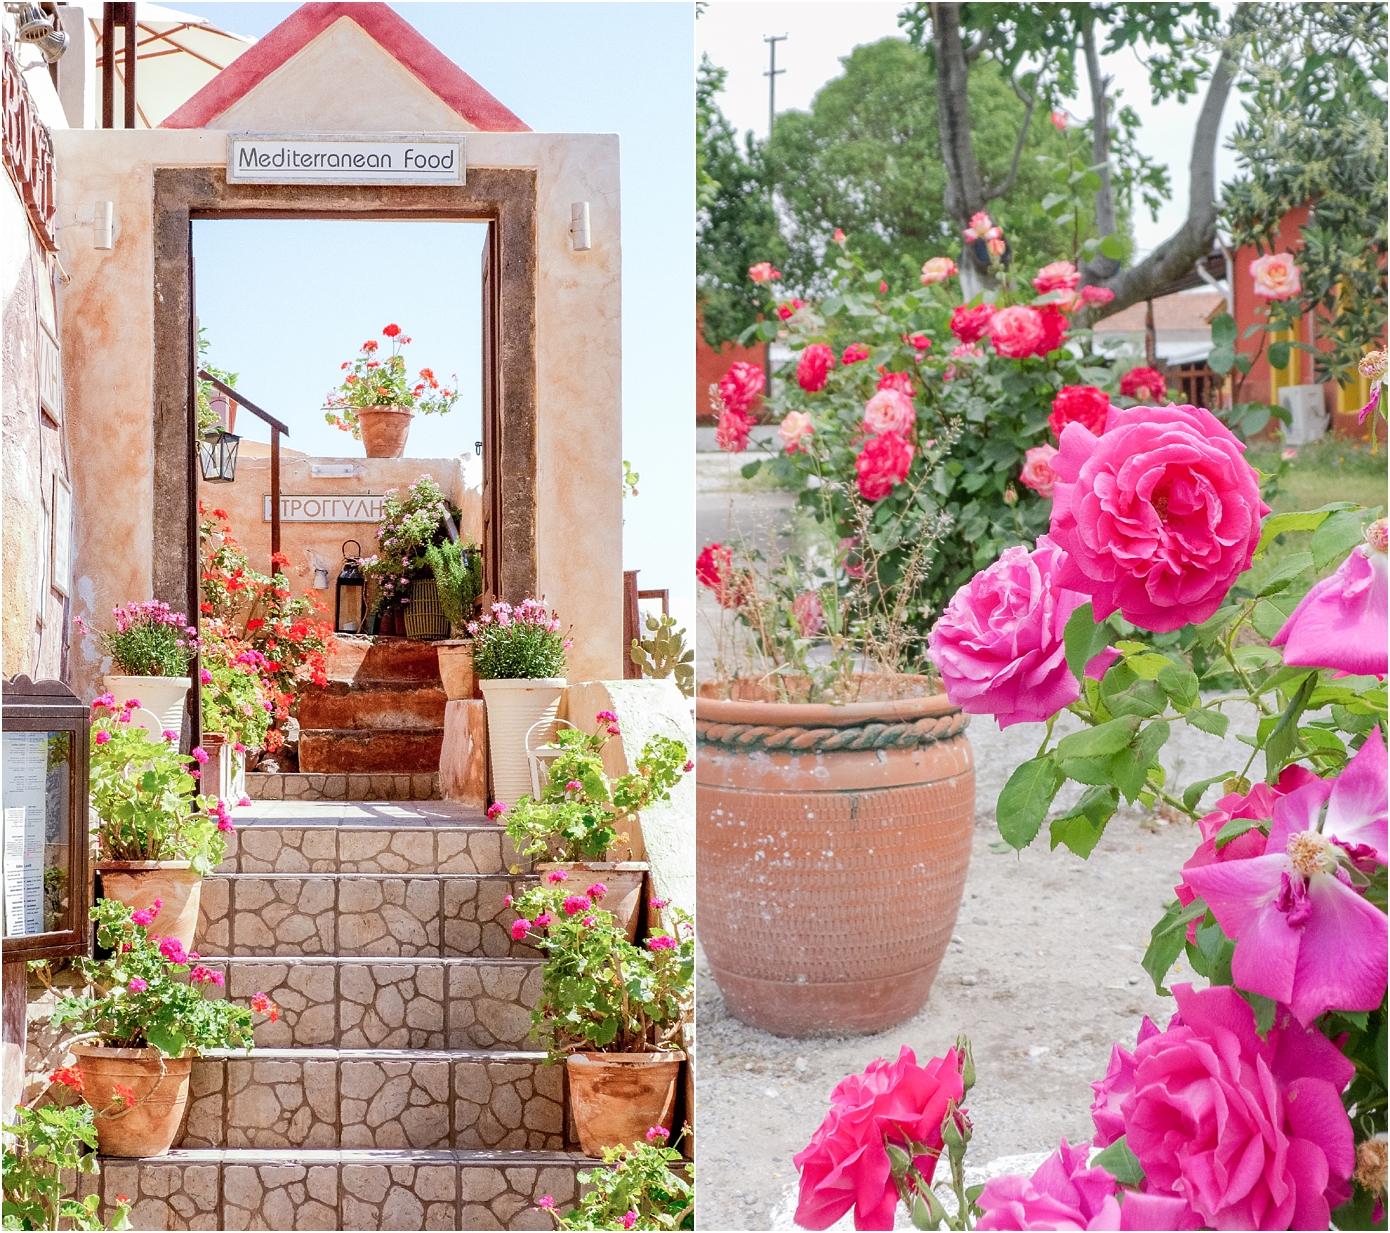 santorini-greece-wedding-photos-in-oia-destination-wedding-photographer-by-courtney-carolyn-photography_0005.jpg